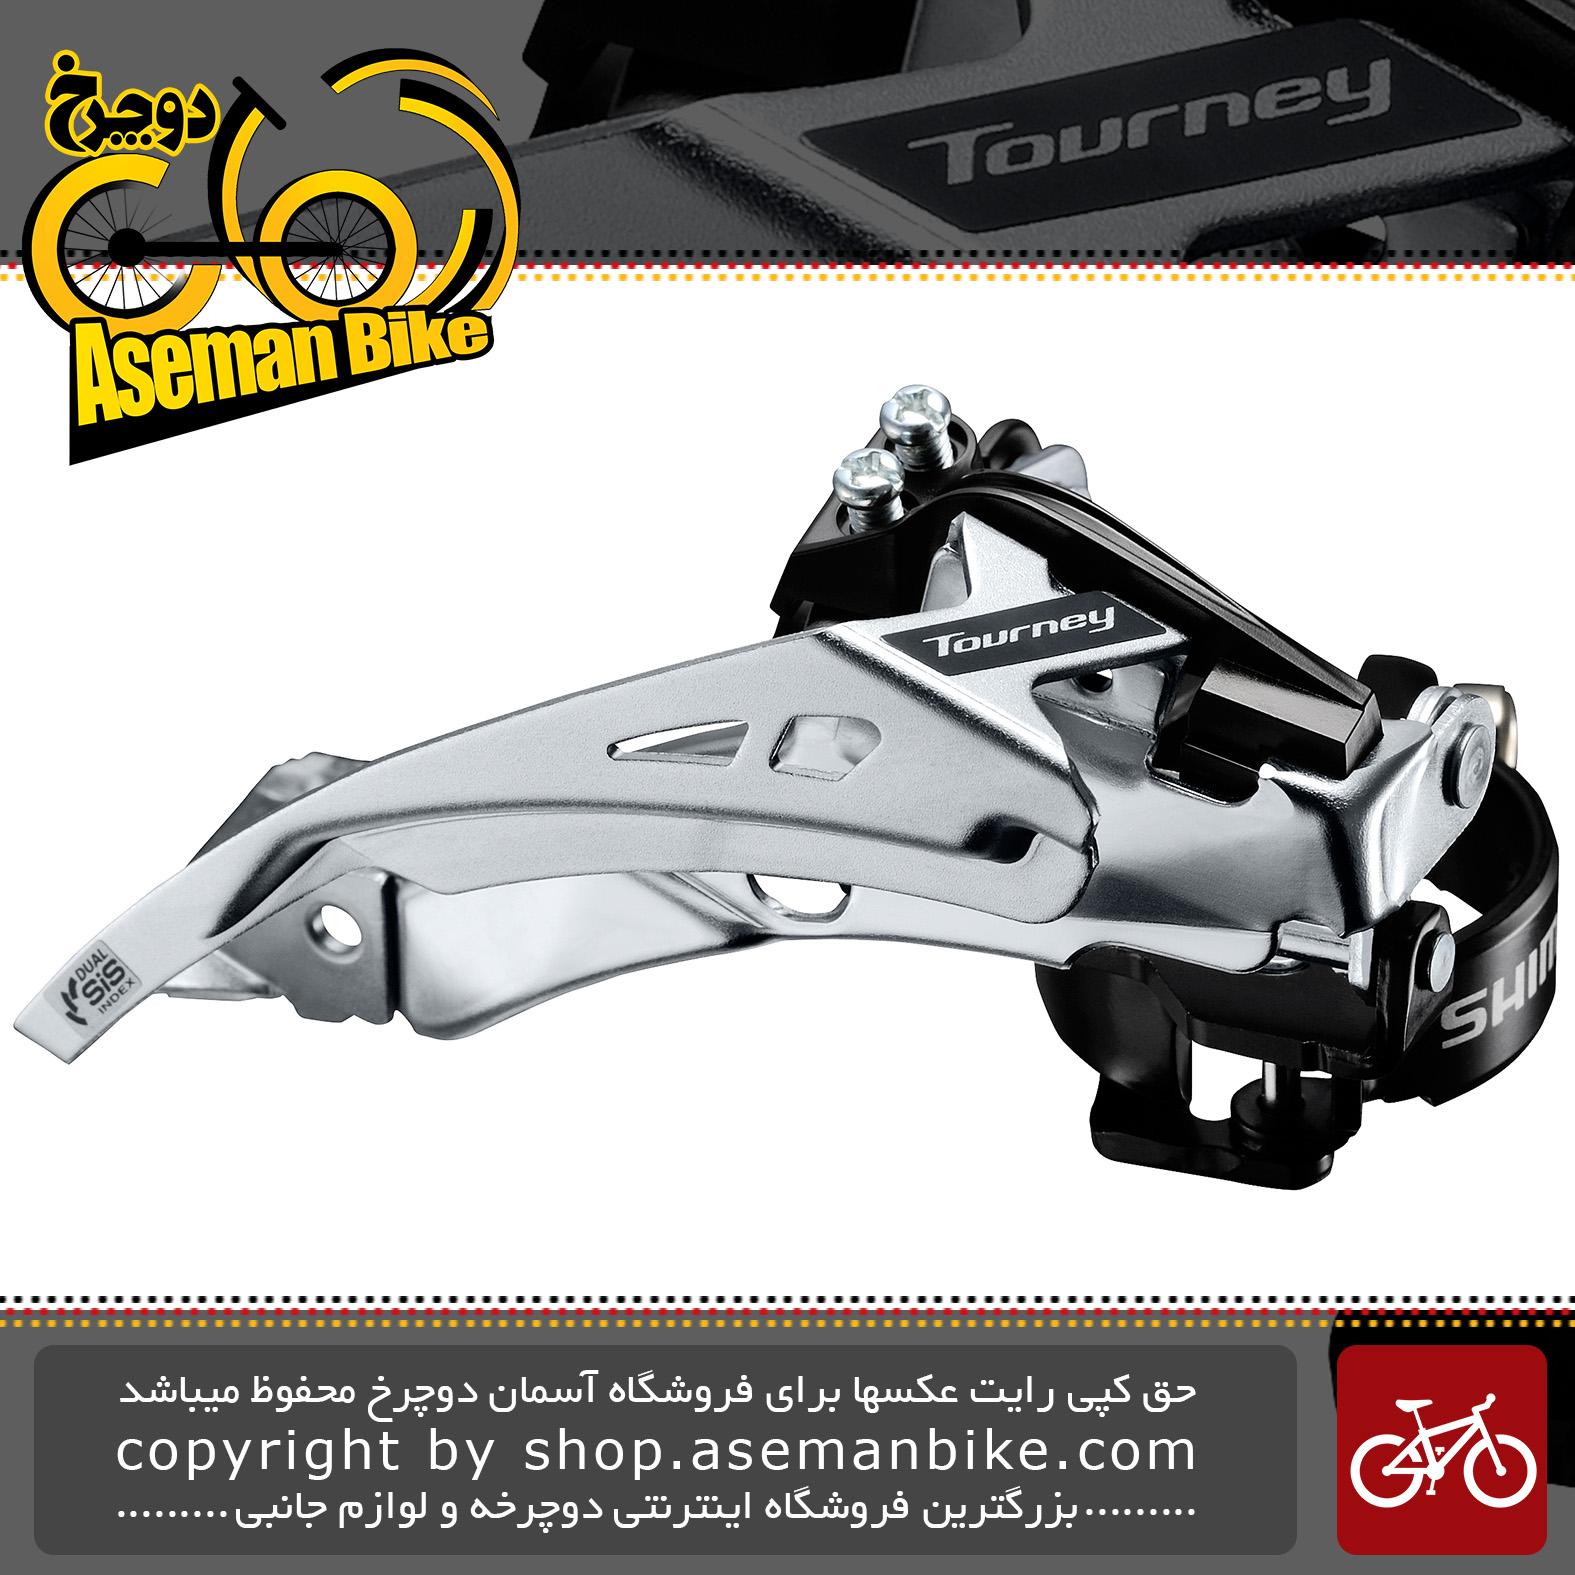 طبق عوض کن دوچرخه شیمانو تورنی Shimano TOURNEY FD-TY700-TS6 TOP SWING Front Derailleur (3x7-6-speed)